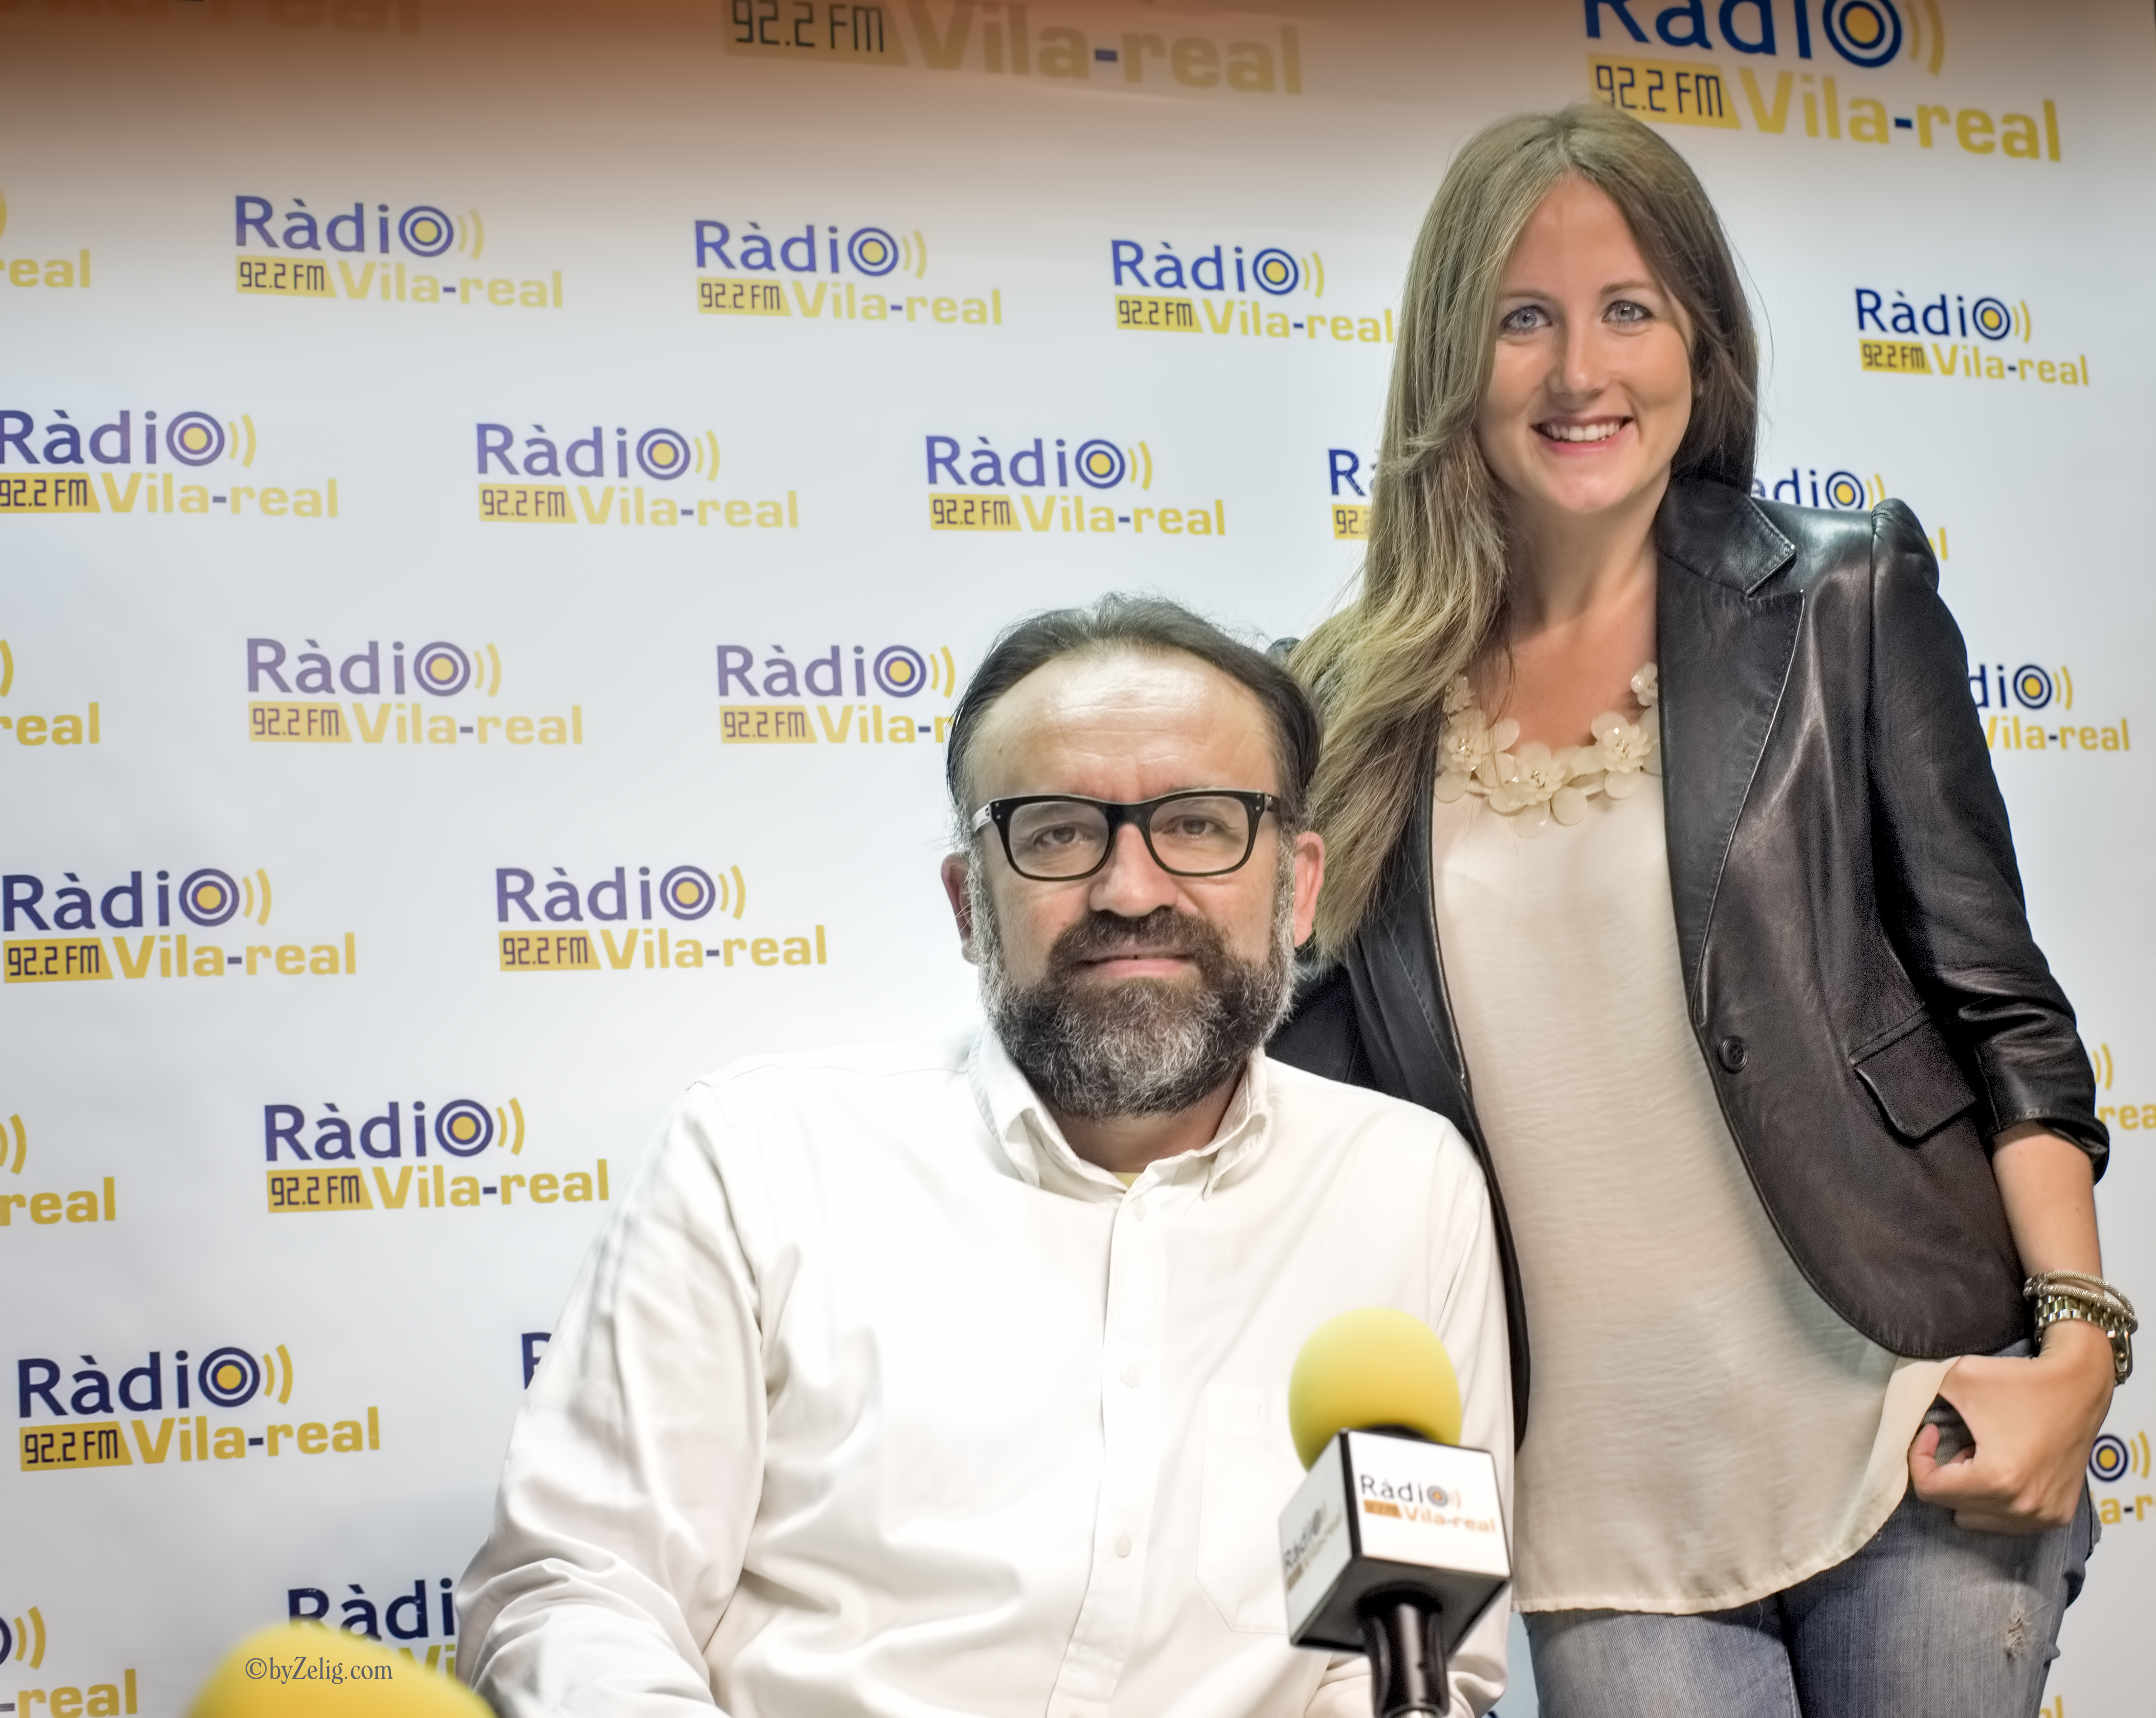 Esports Radio Vila-real. Programa del 8 de febrero de 2017